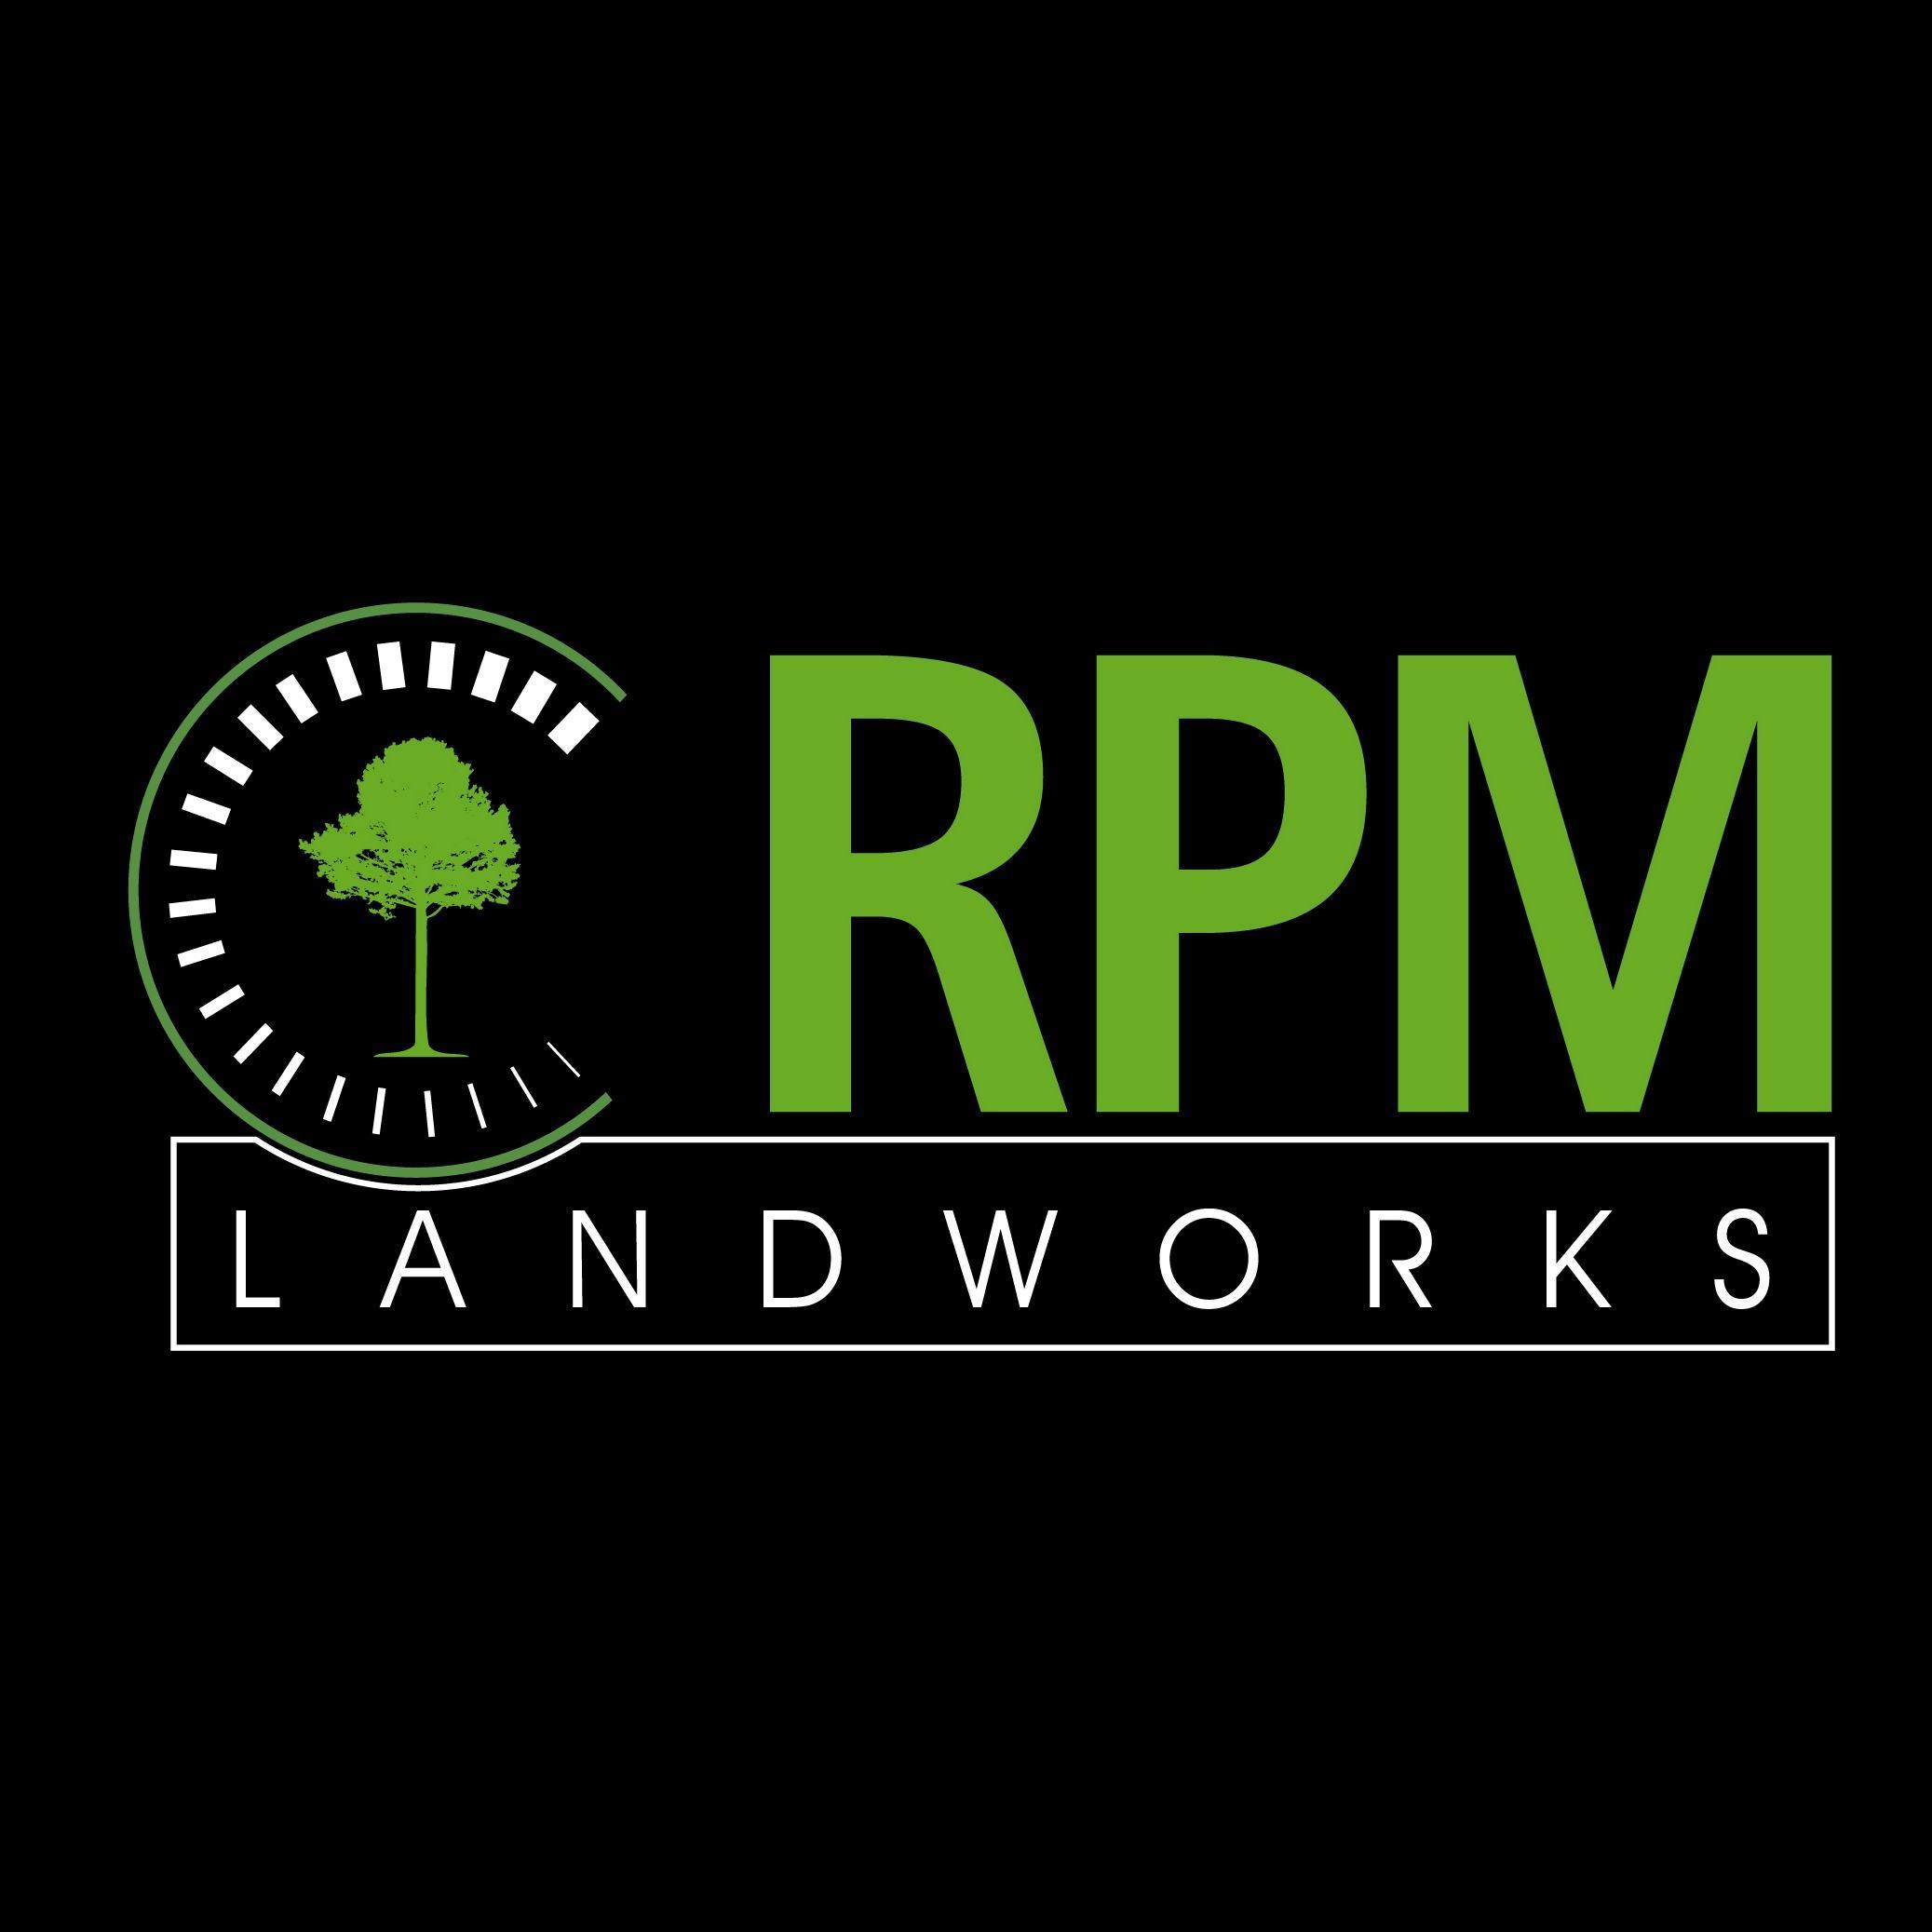 RPM Landworks